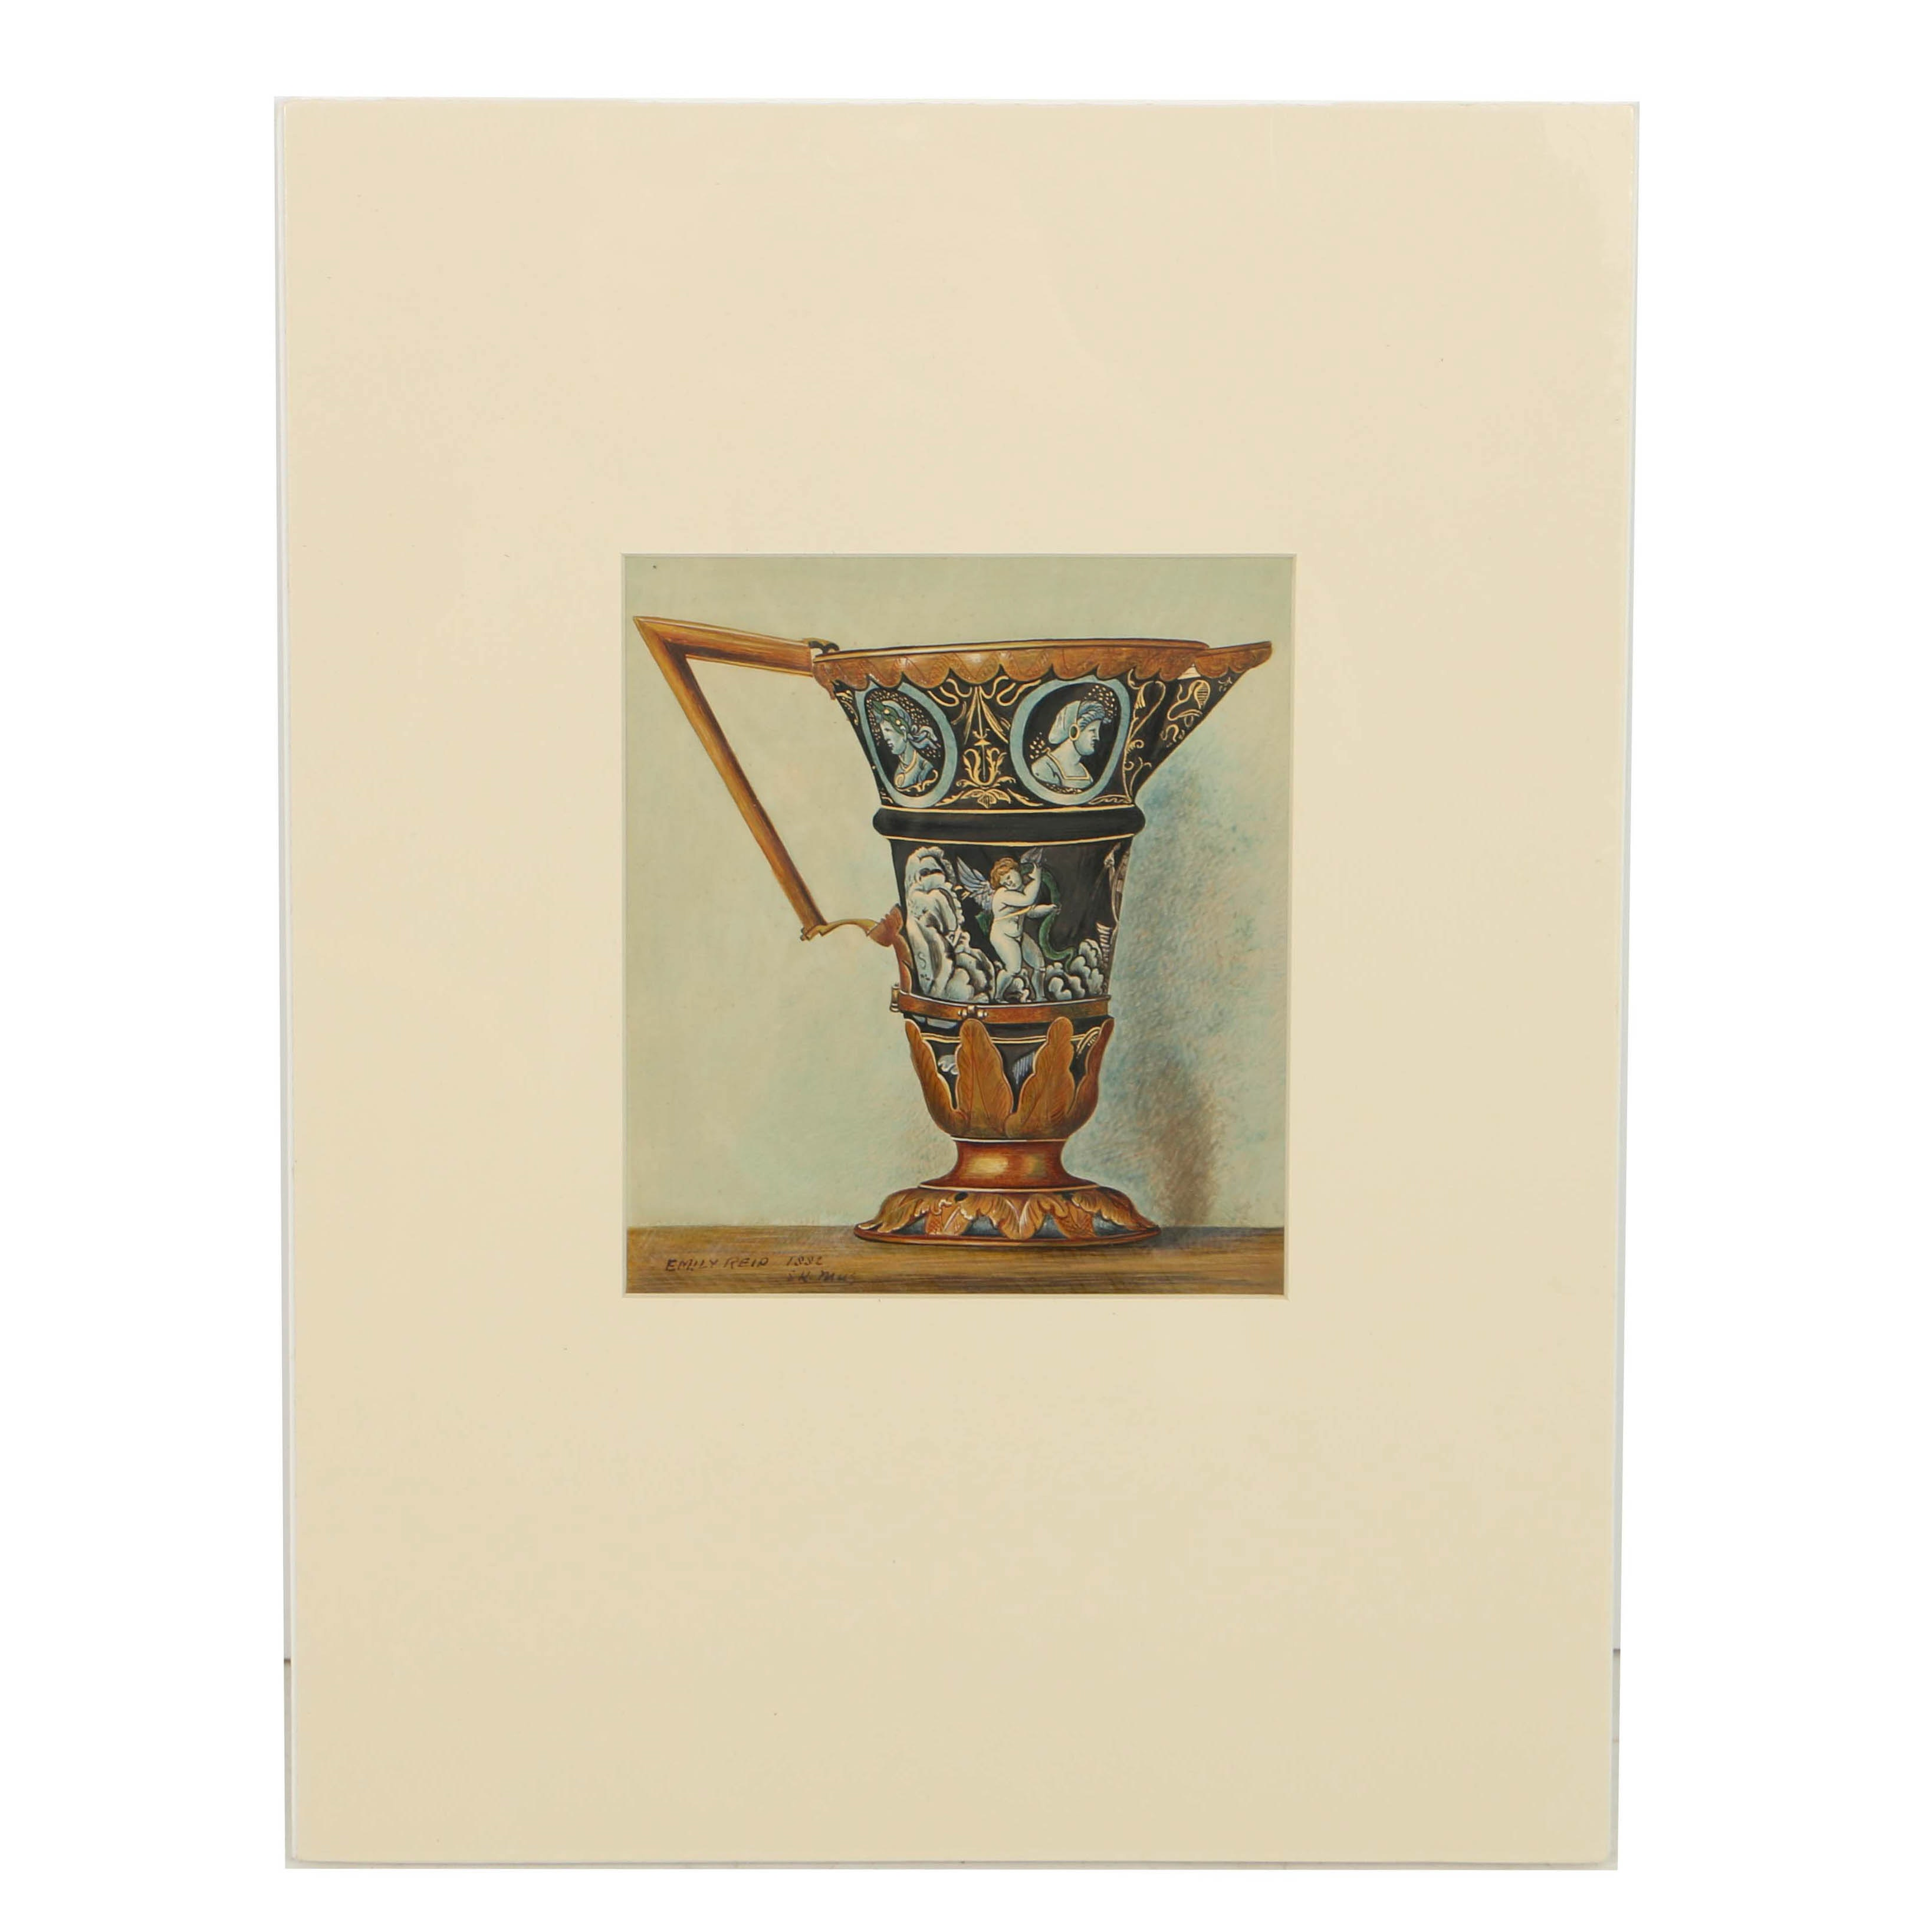 Emily Reid Gouache Painting on Salt Print of a Limoges Enamel Ewer